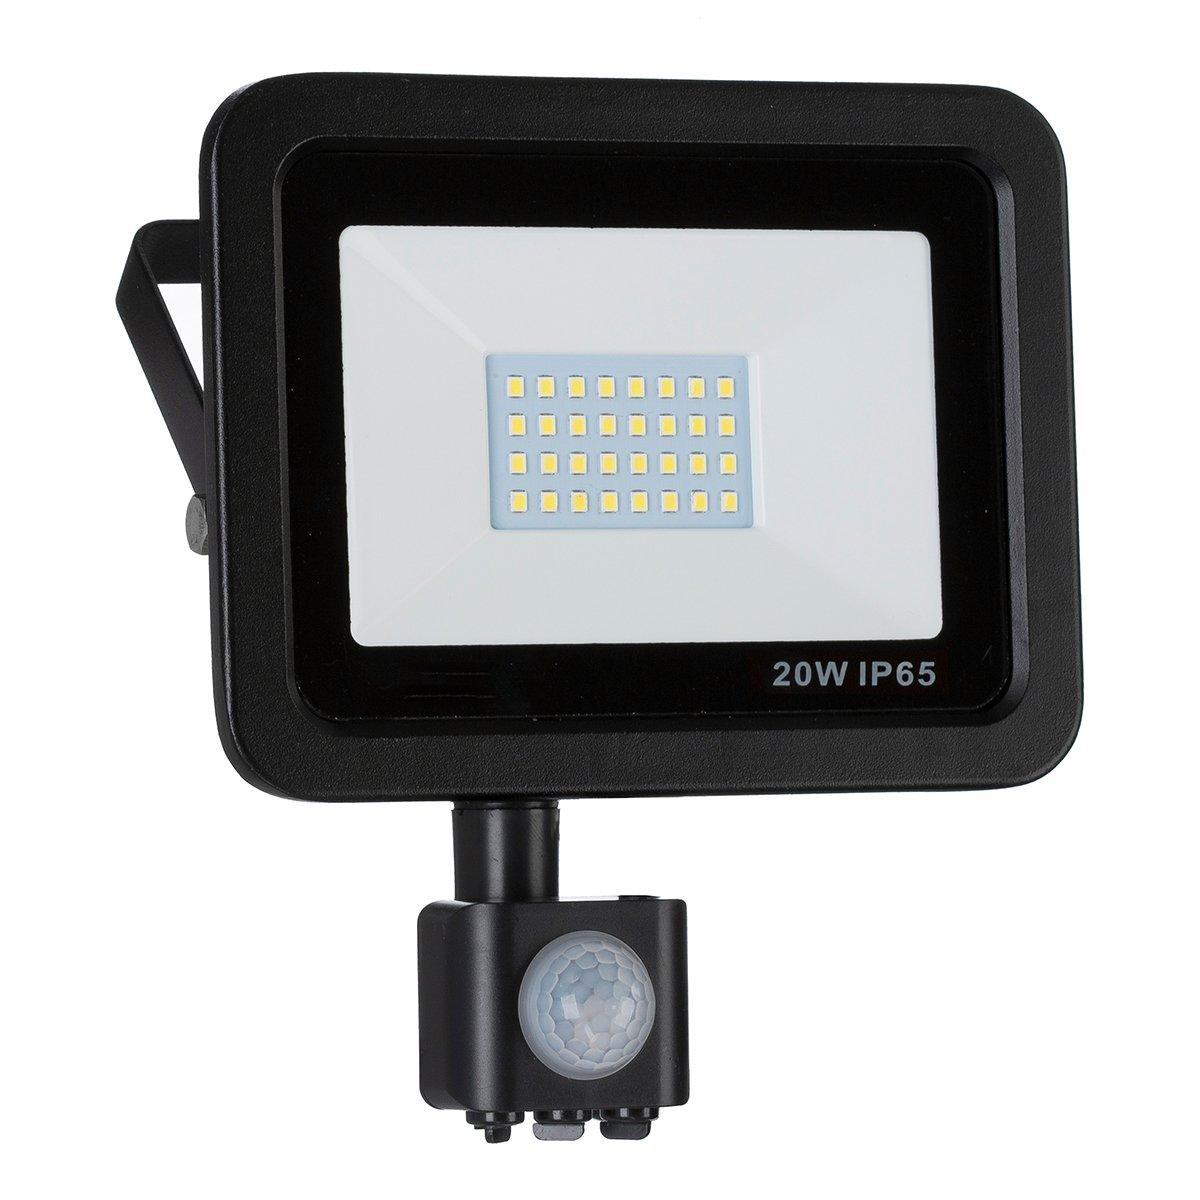 LED Strahler, LED Fluter, SLIM 50 Watt Kaltweiss 6000K LED Flutlicht, 50W 4500 Lumen Ersetzt 500 Watt, 220-240V, LumenTEC (50W Kaltweiss) [Energieklasse A+]